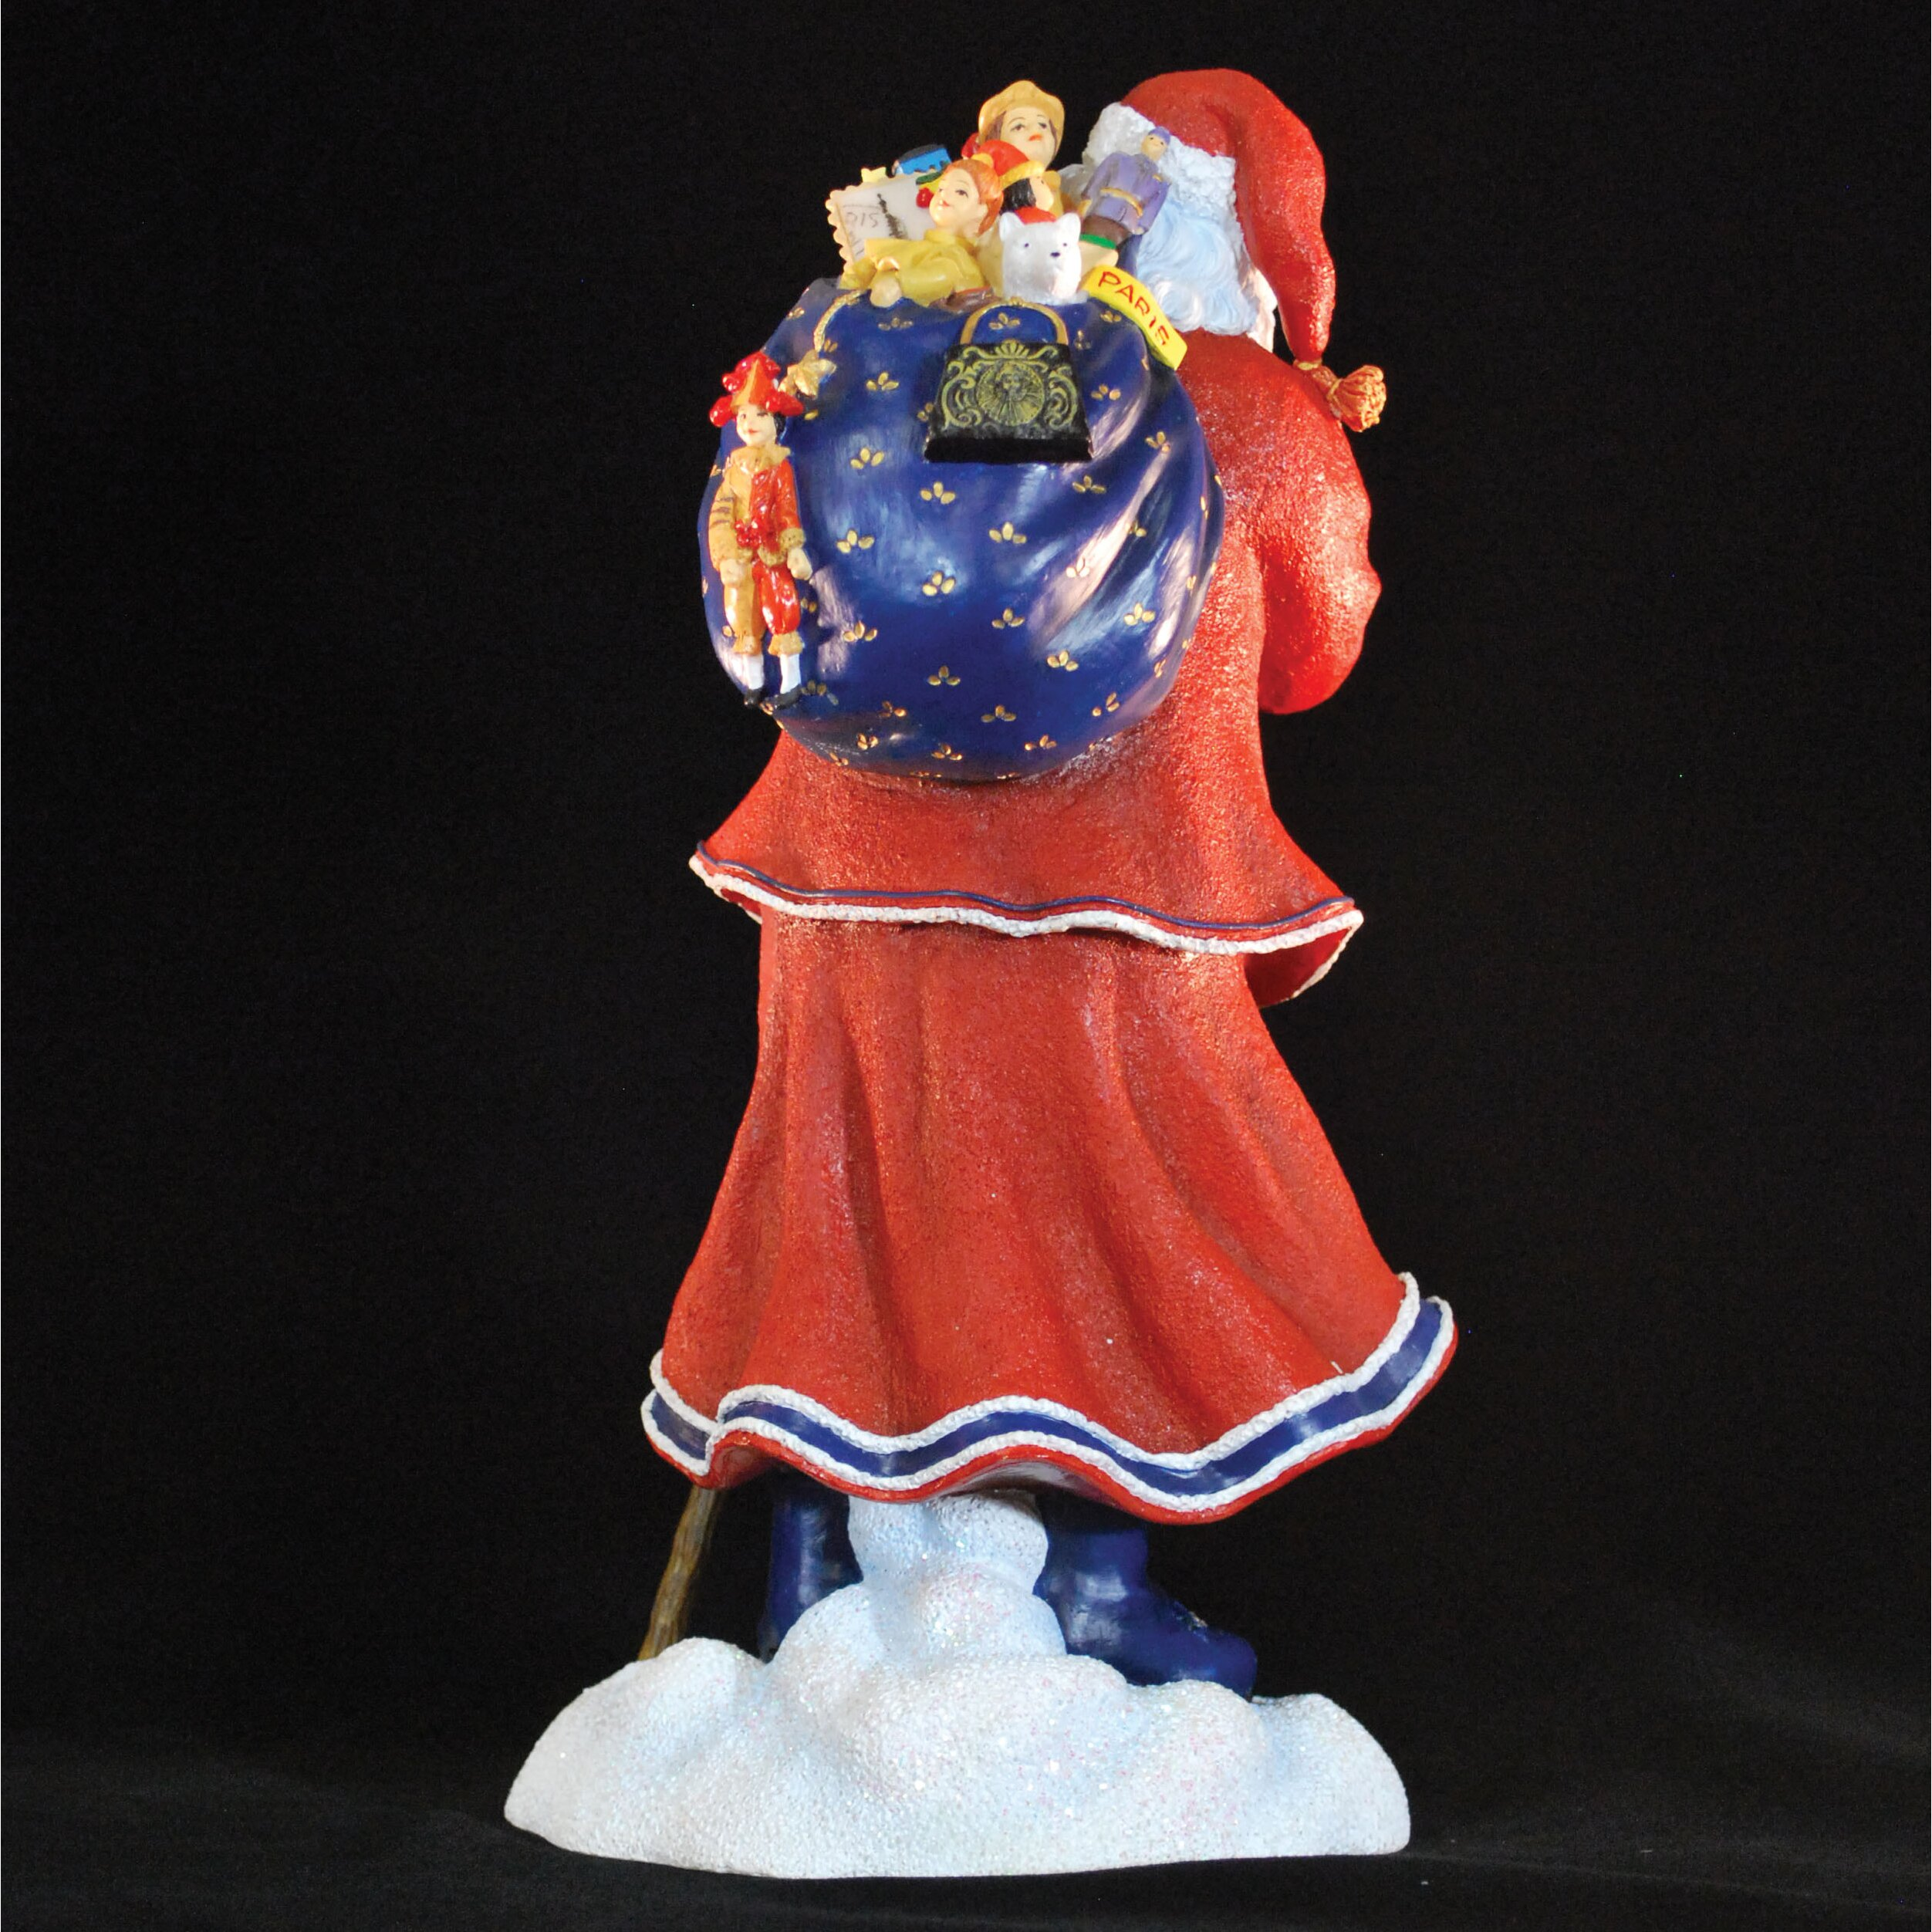 Precious moments pere noel of paris limited edition santa with blue bag of toys figurine wayfair - Petit pere noel figurine ...